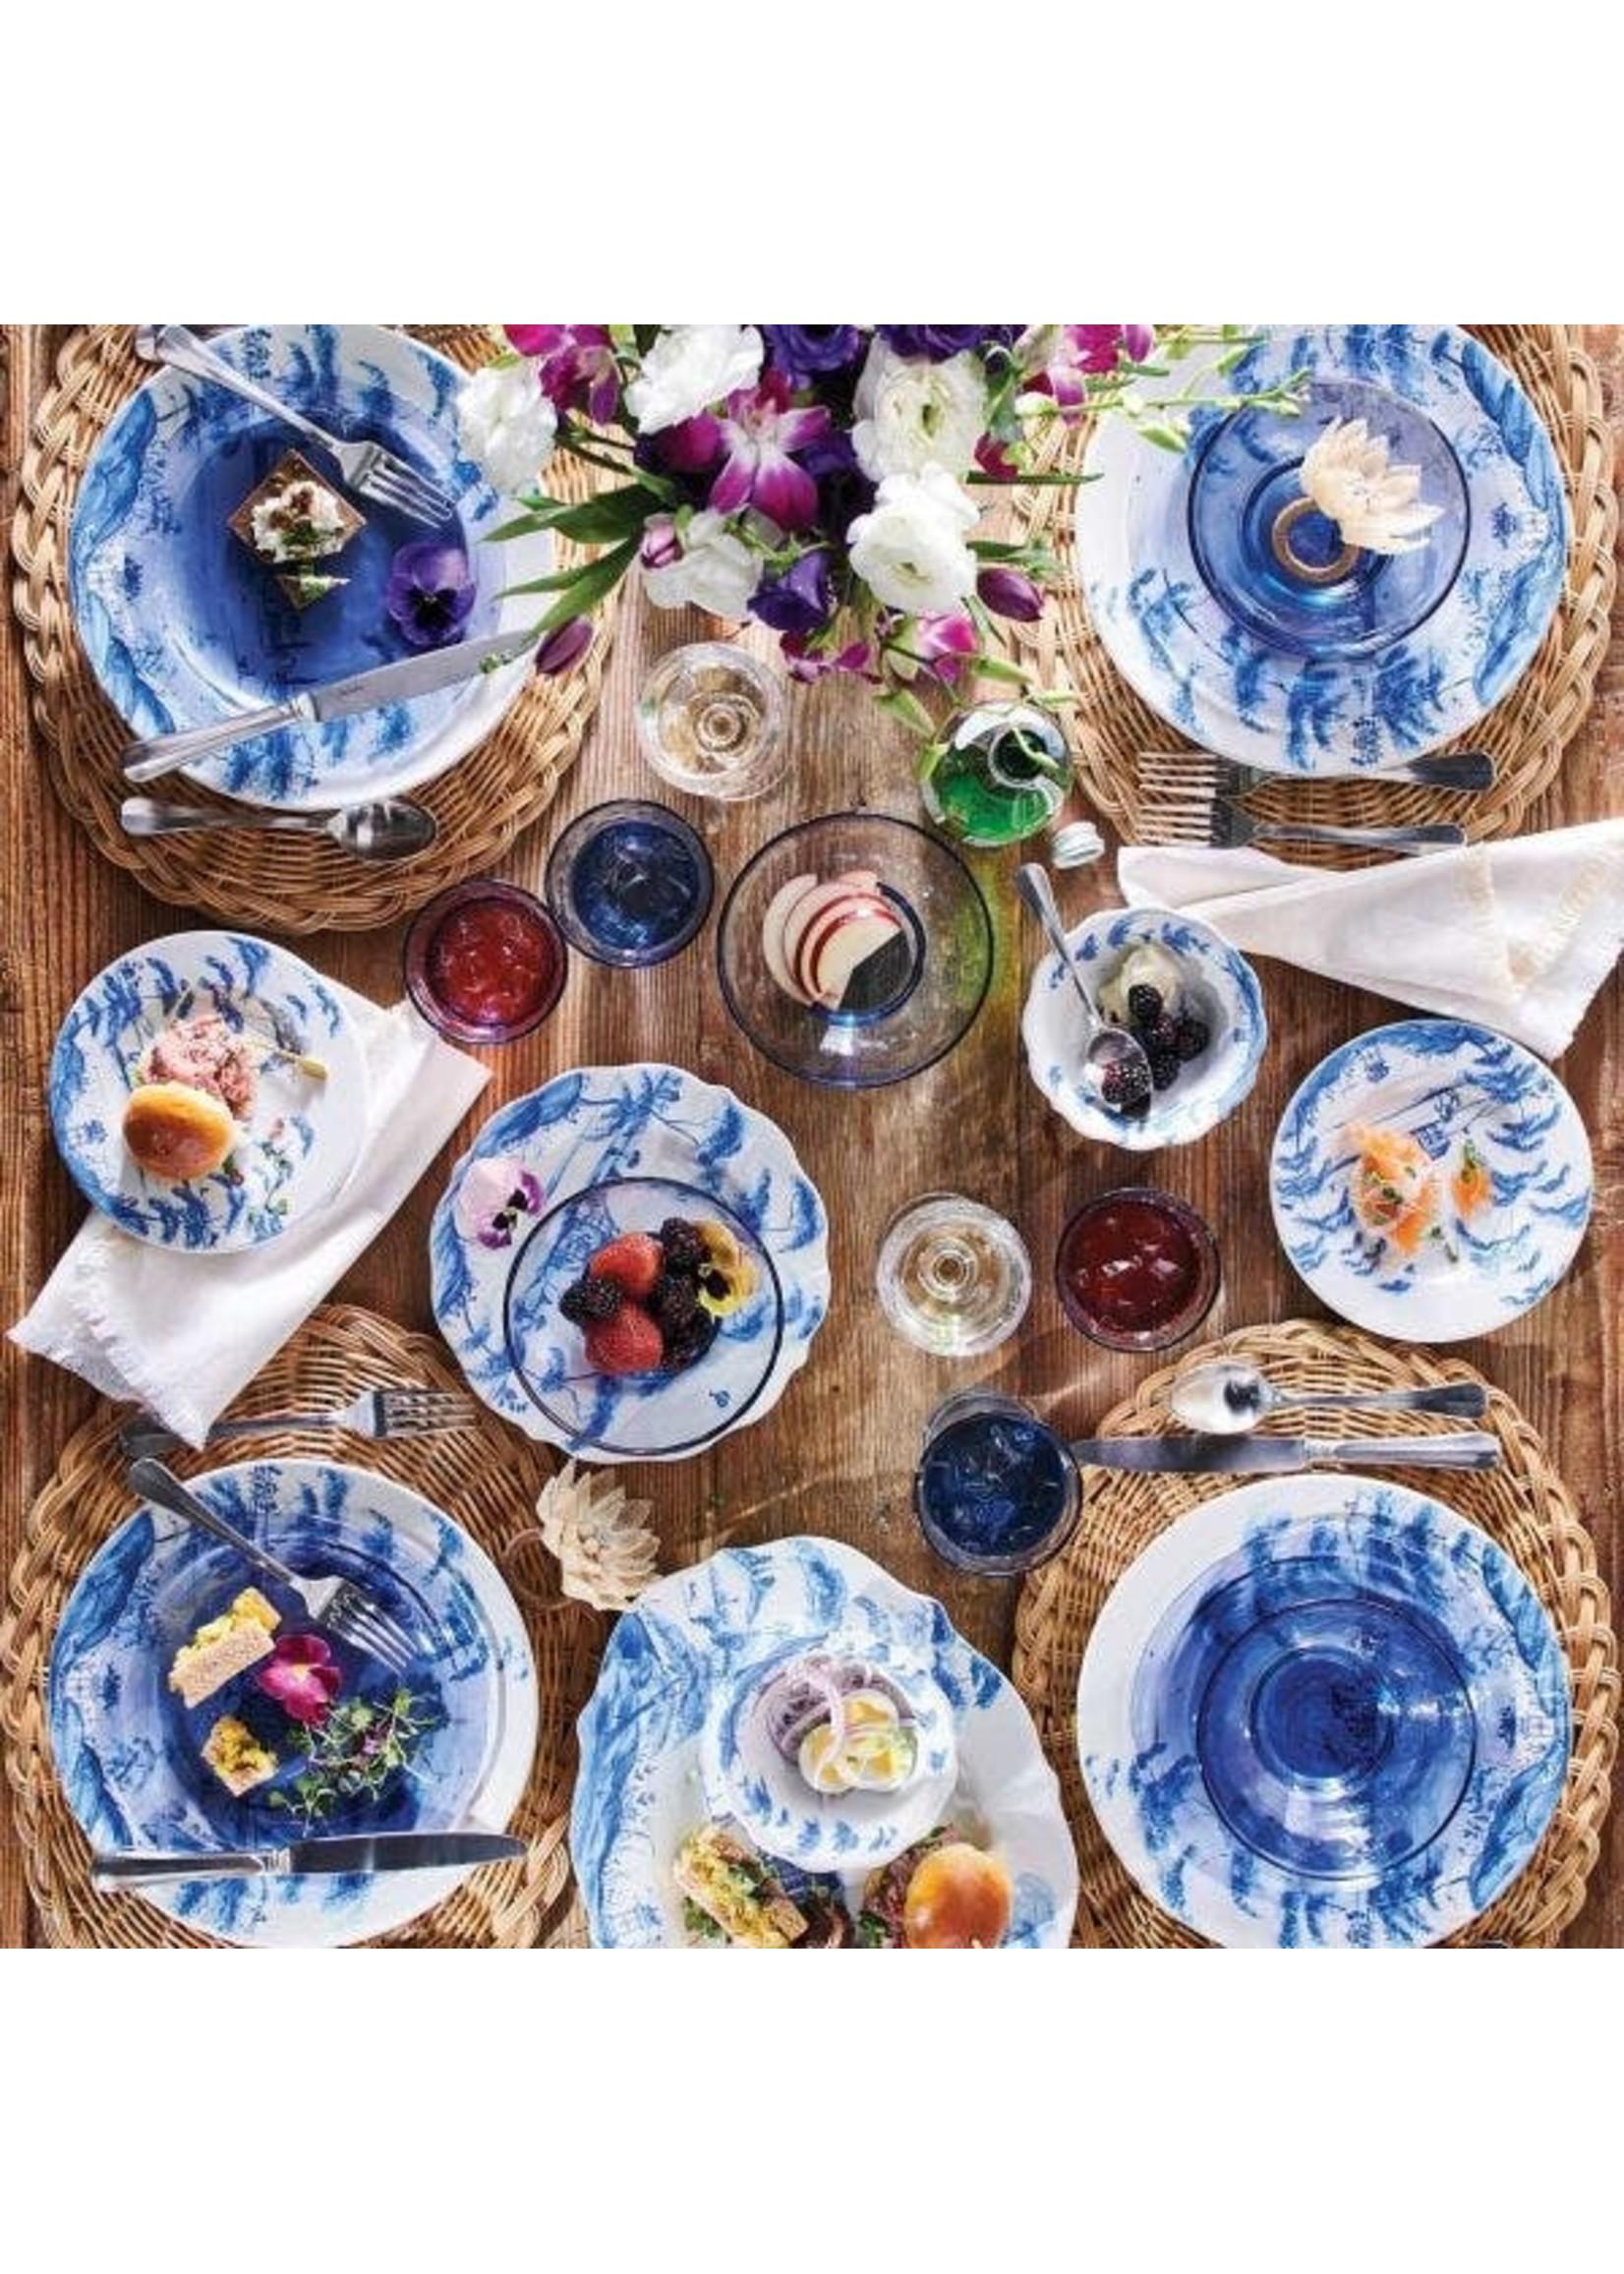 Juliska Country Estate - Delft - Party Plate (Set of 4) Box Spring Scenes